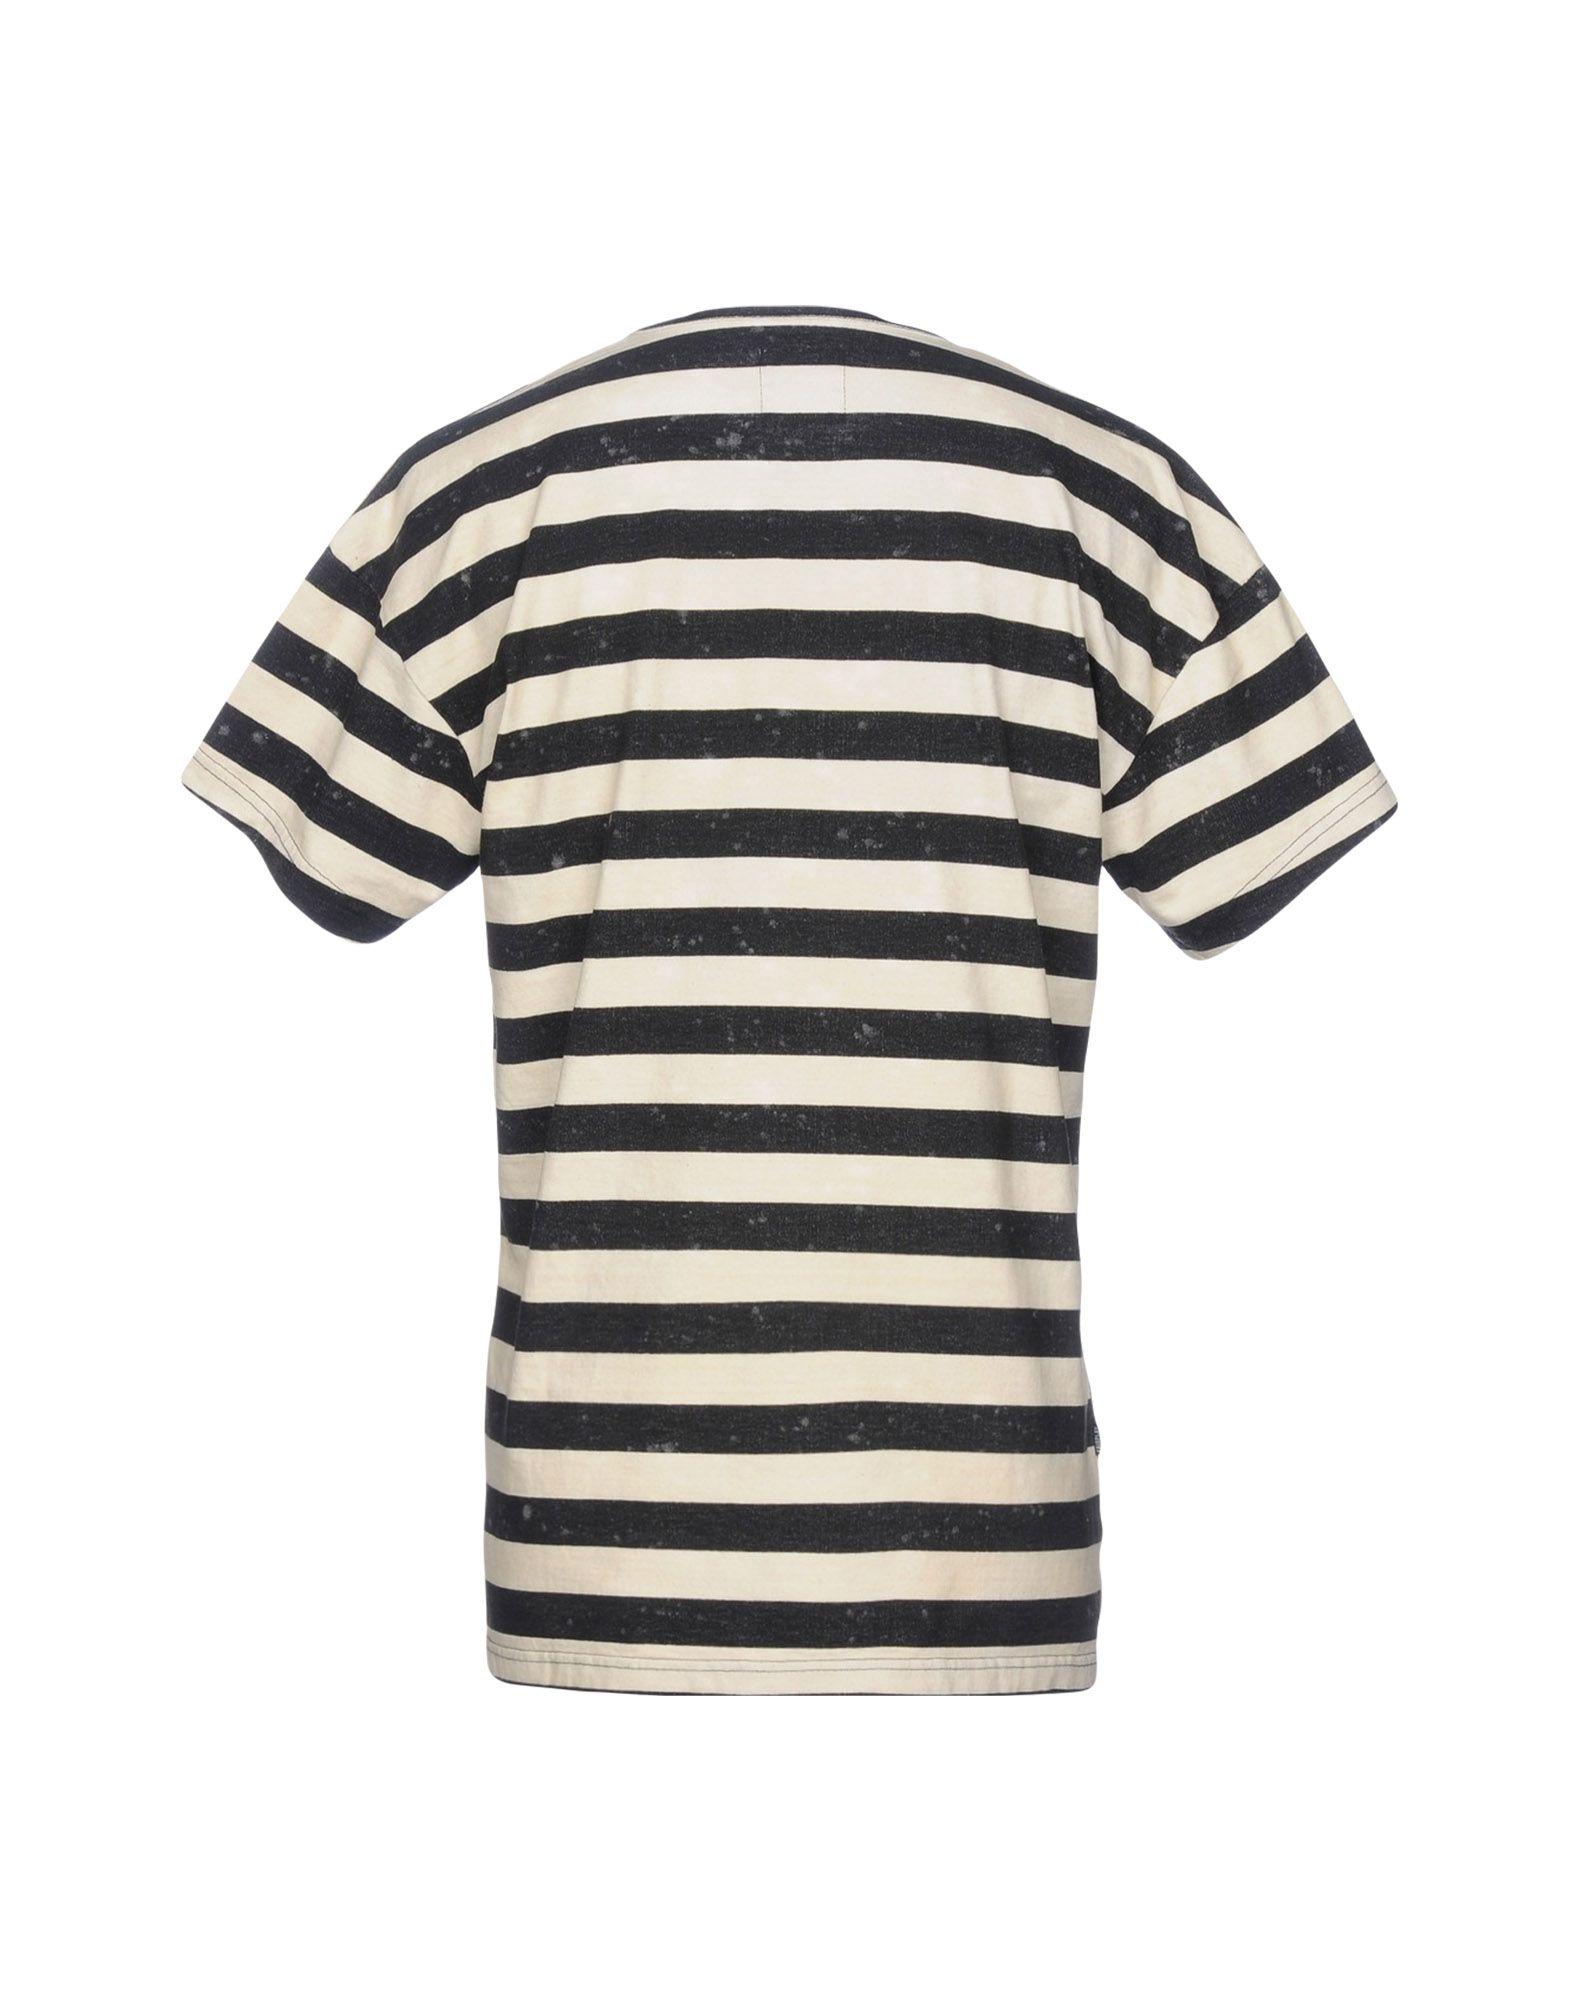 A buon mercato A buon mercato mercato buon T-Shirt Fairplay Uomo - 12167109QW 86907c